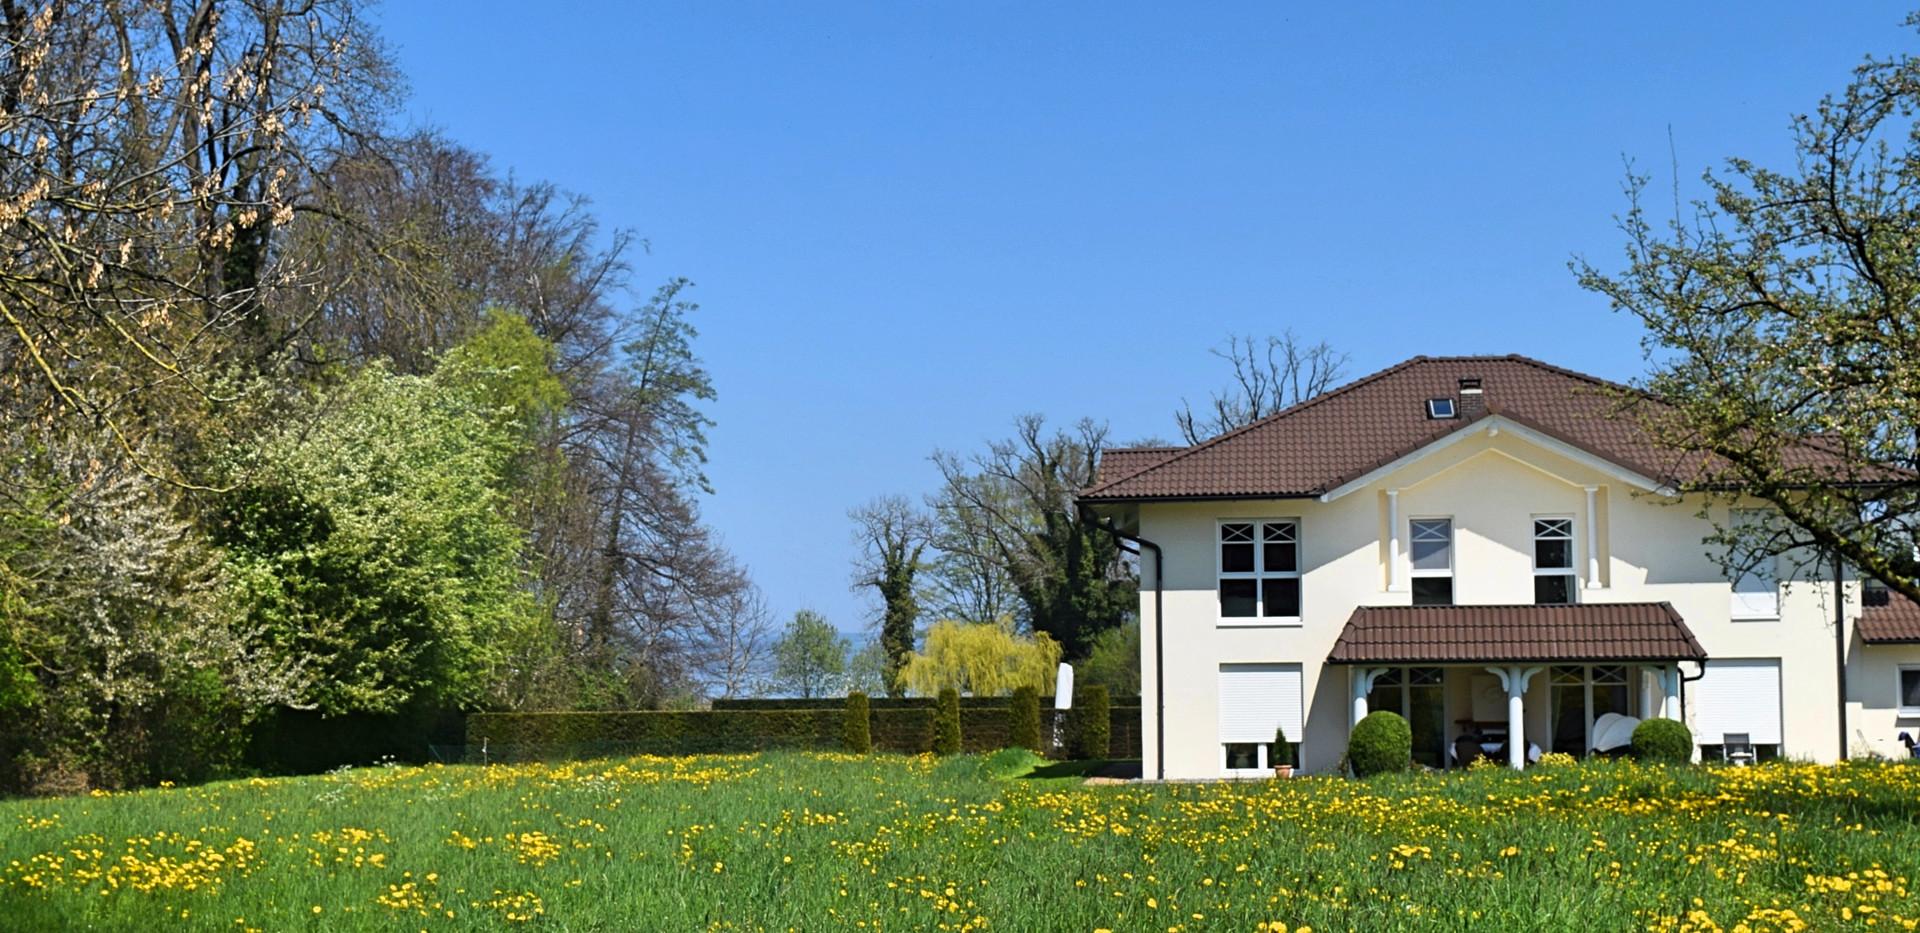 Haus_im_Frühling_Ostern_2019_Fotor.jpg